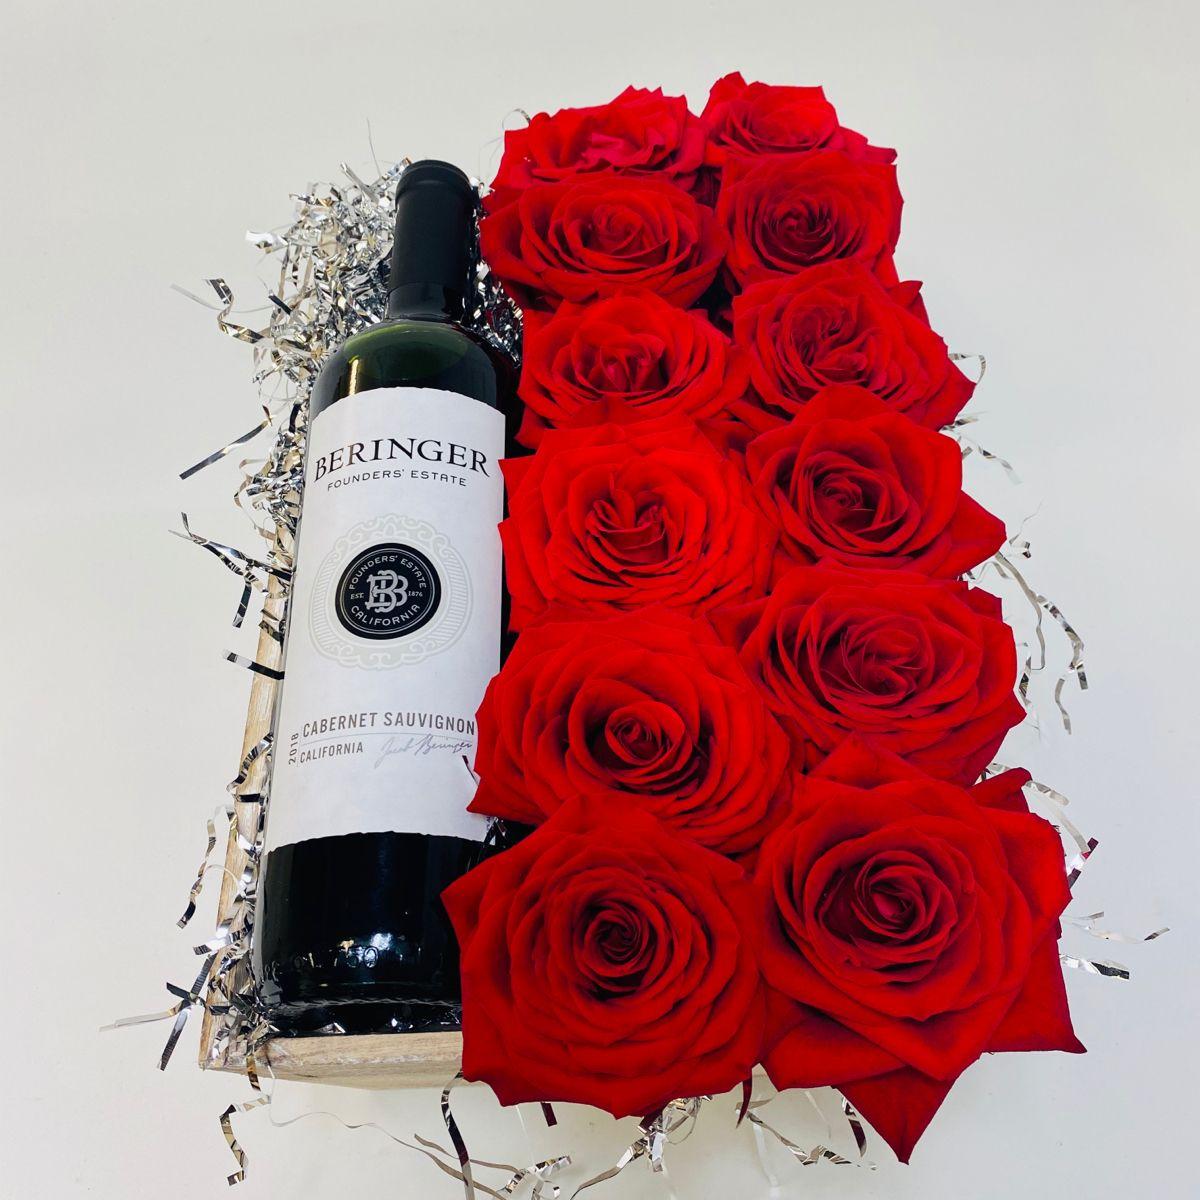 Beringer Wine Red Roses Basket Beringer Wine Wine Red Roses